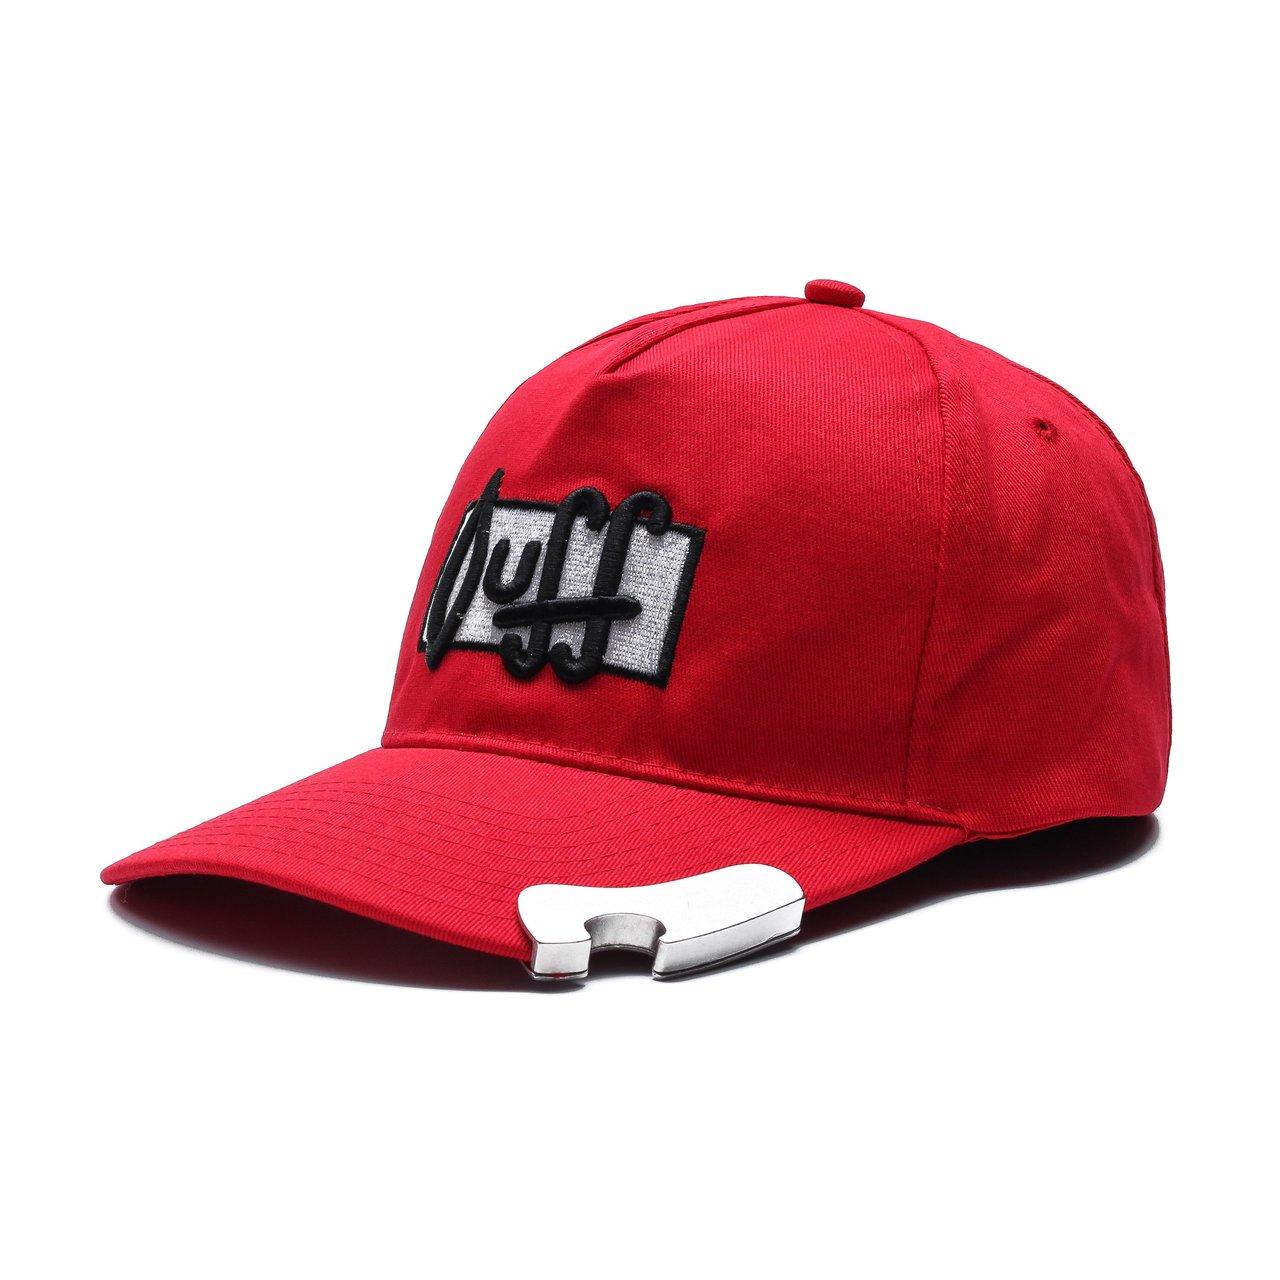 Duff Beer Adjustable Snap-Back Hat with Bottle Opener